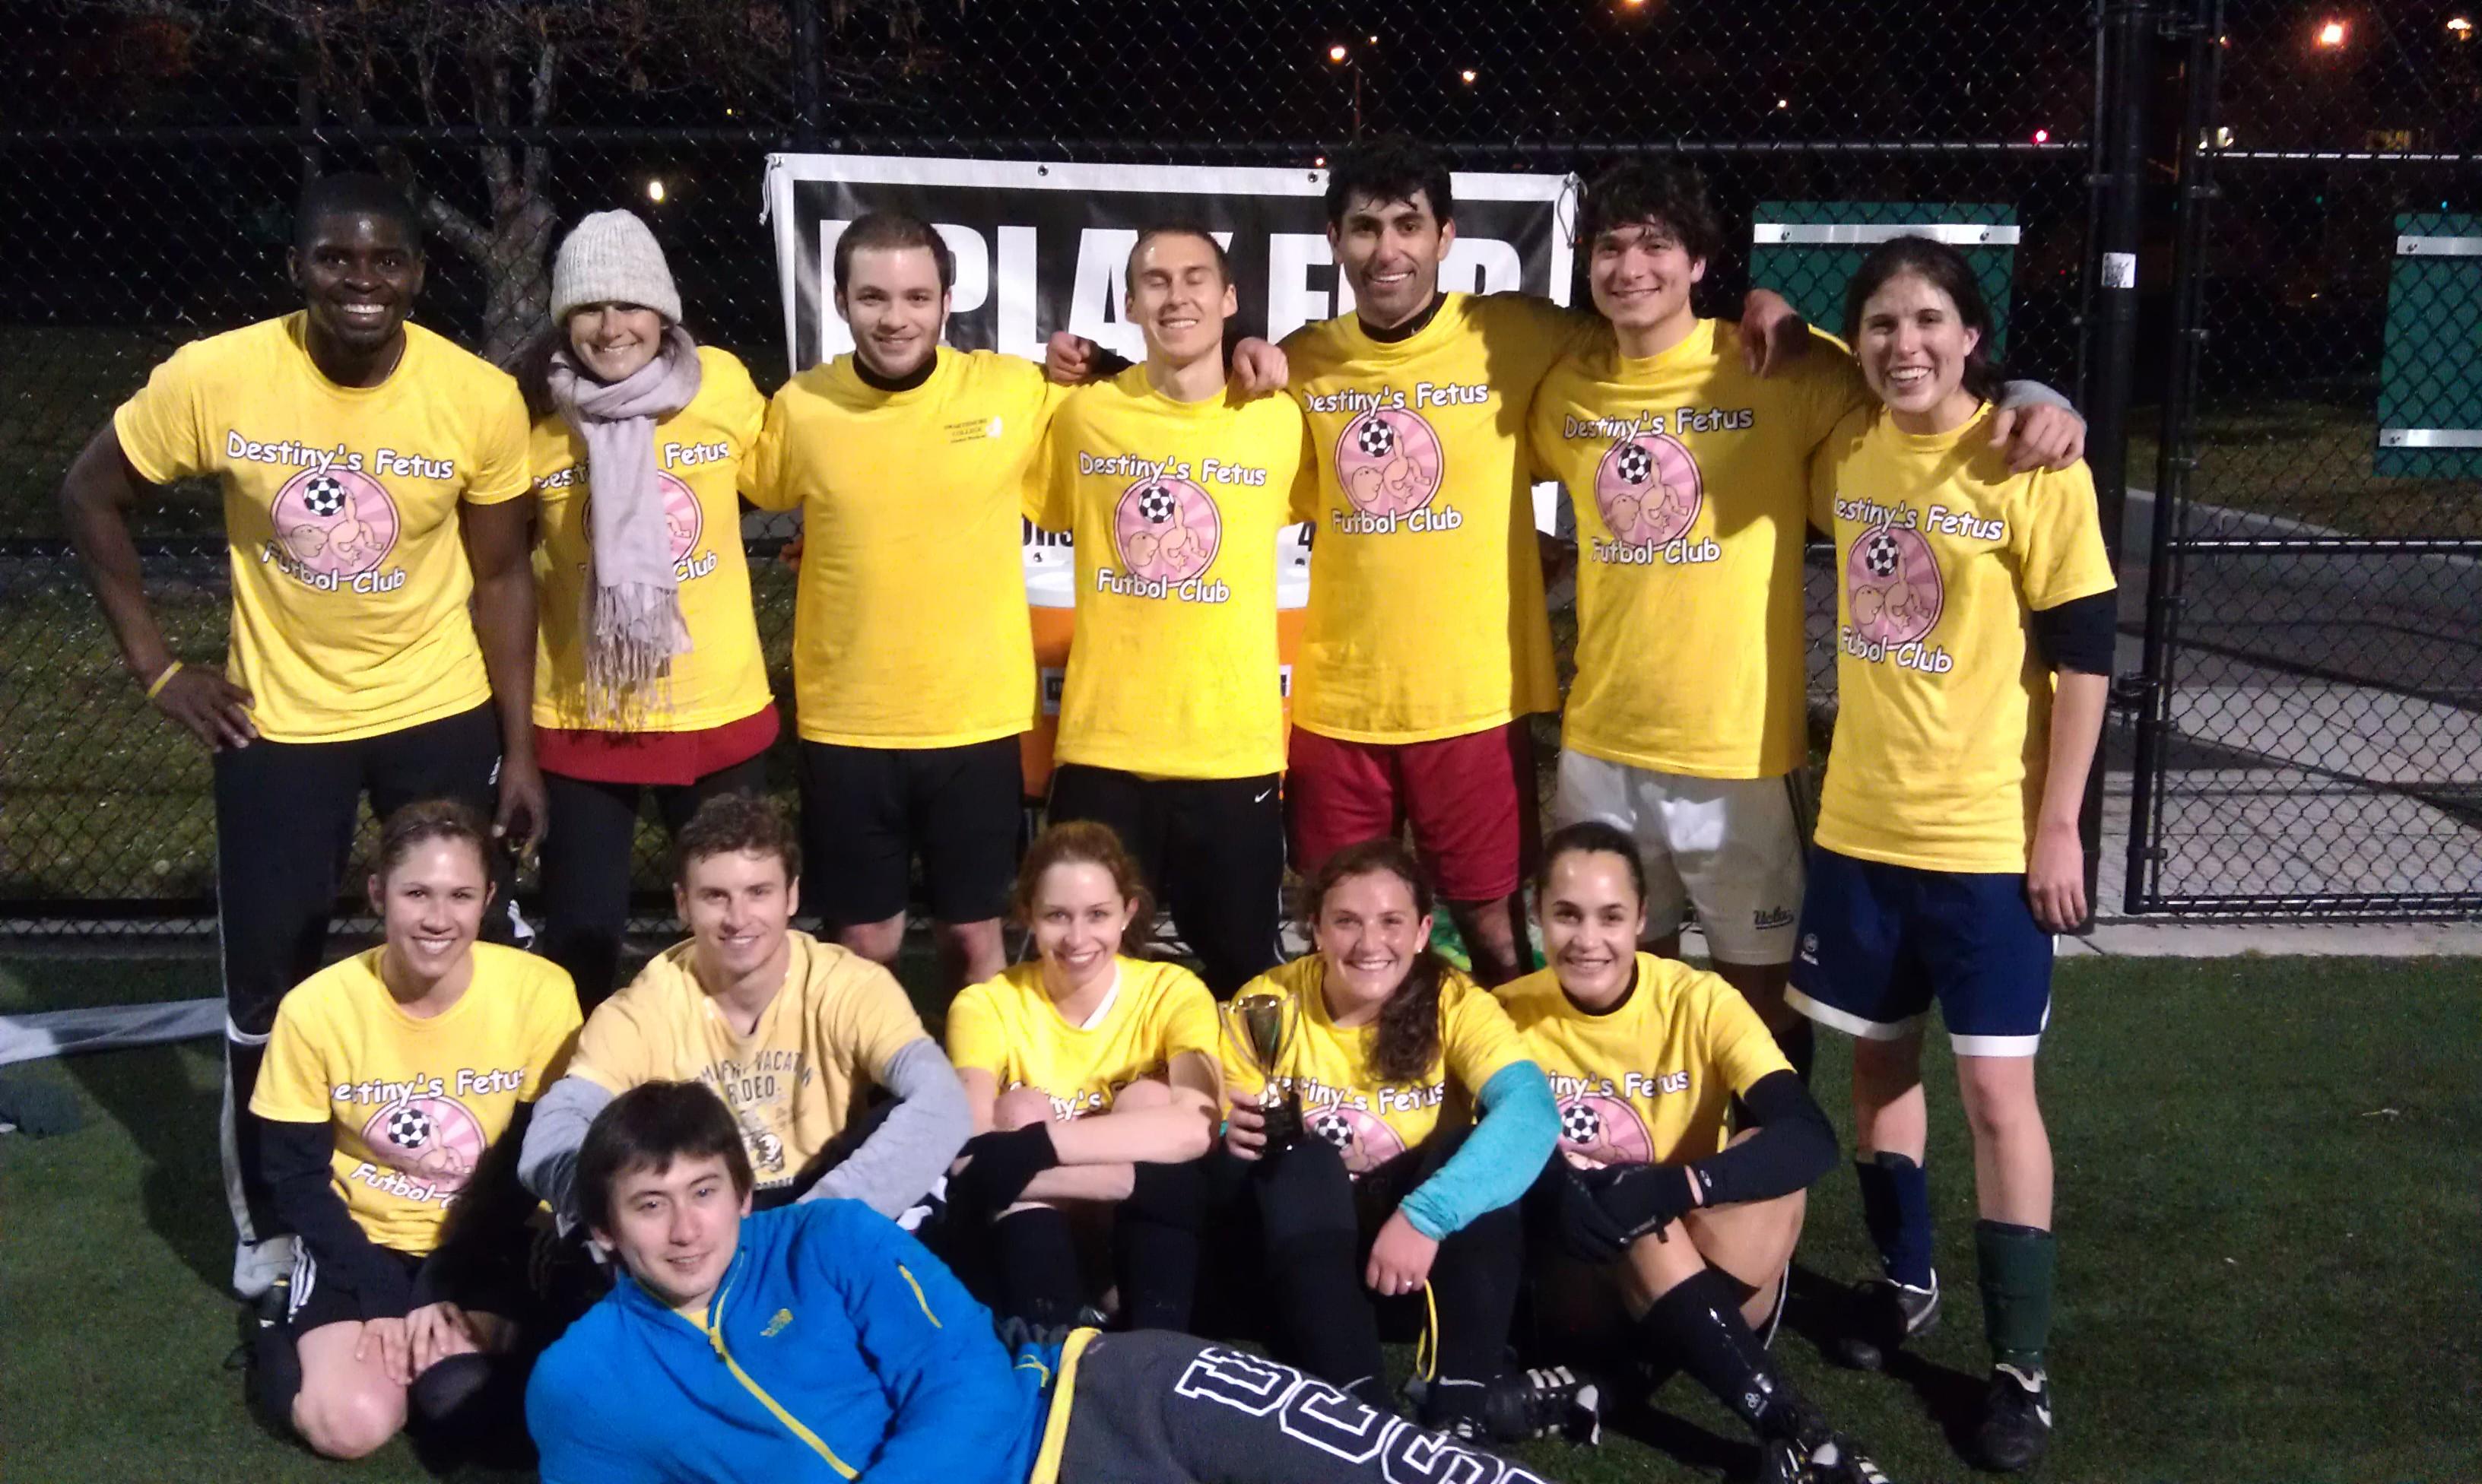 7b43cbf6a Custom T-Shirts for Destinys Fetus Soccer Champions! - Shirt Design ...